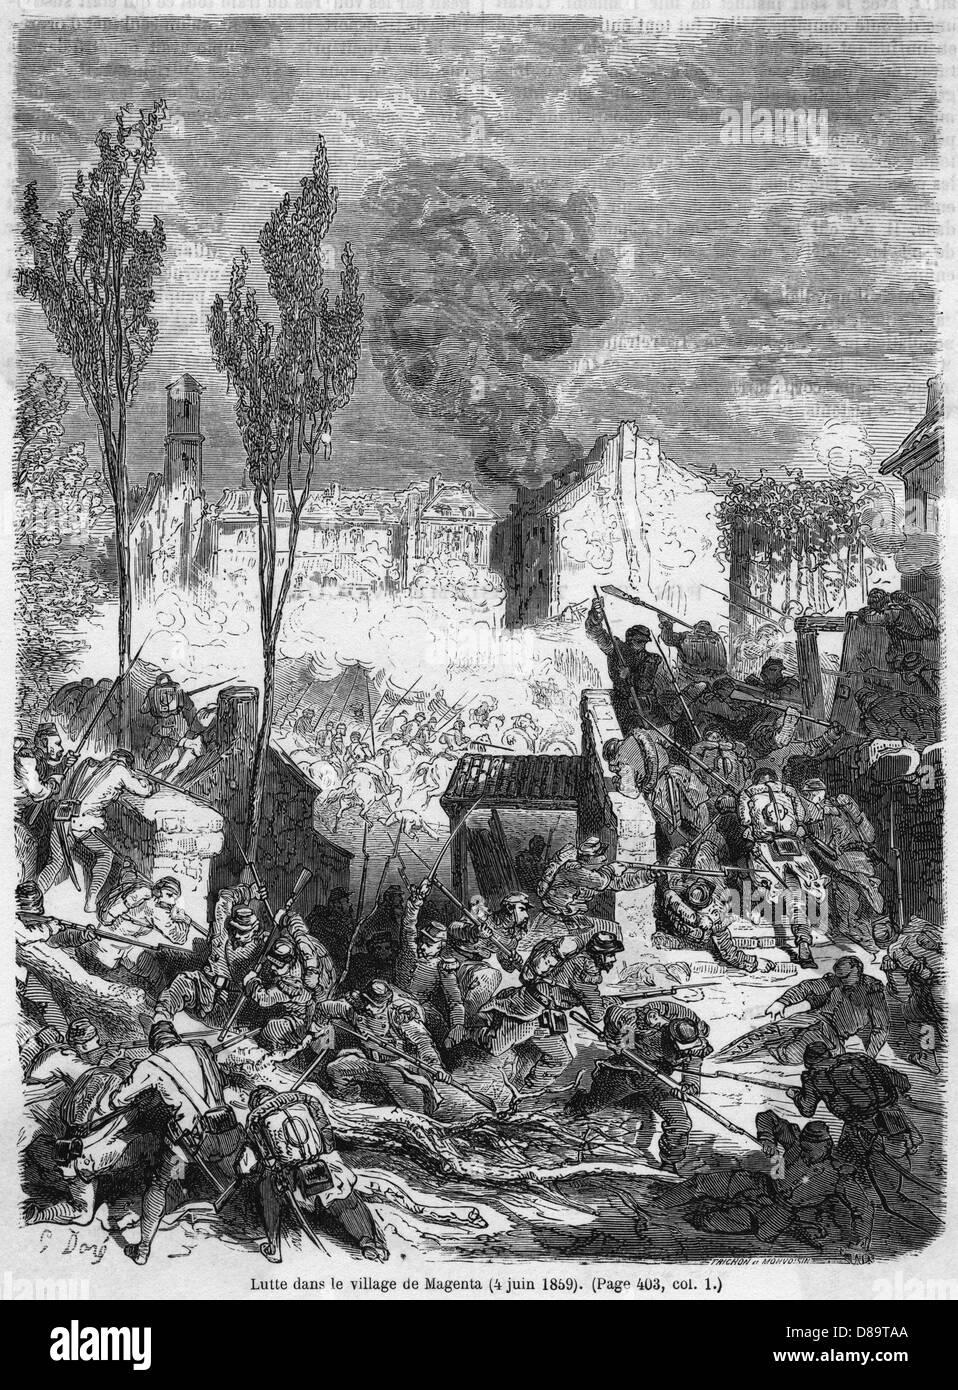 Battle Of Magenta 5 - Stock Image